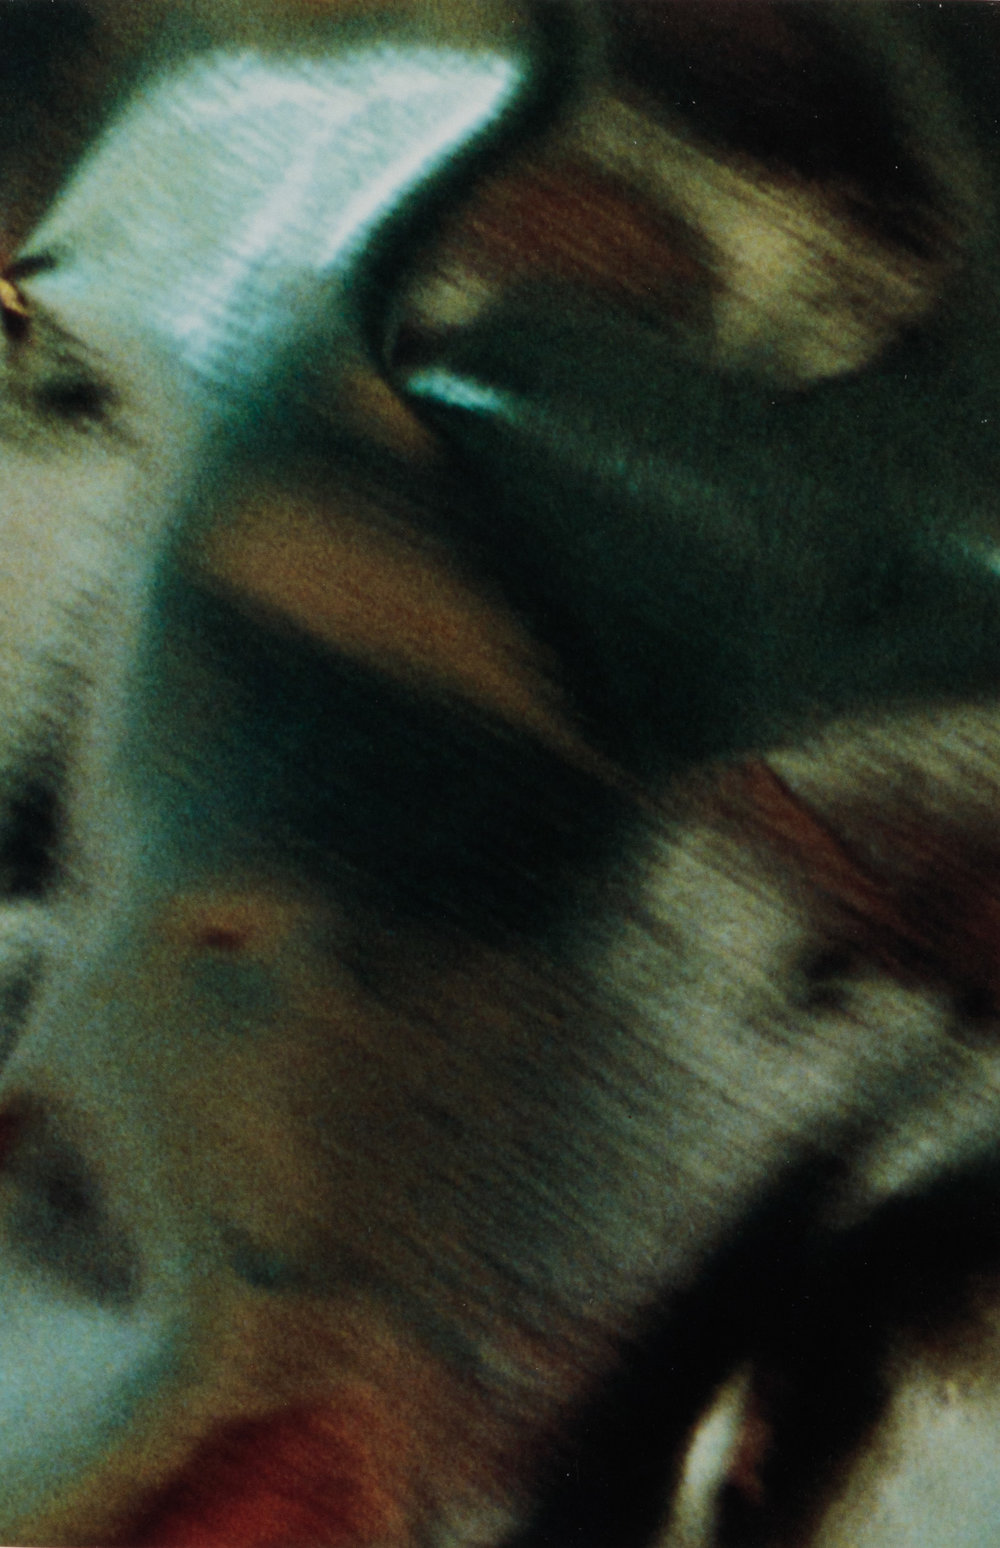 C-9279-web-cropped.jpg